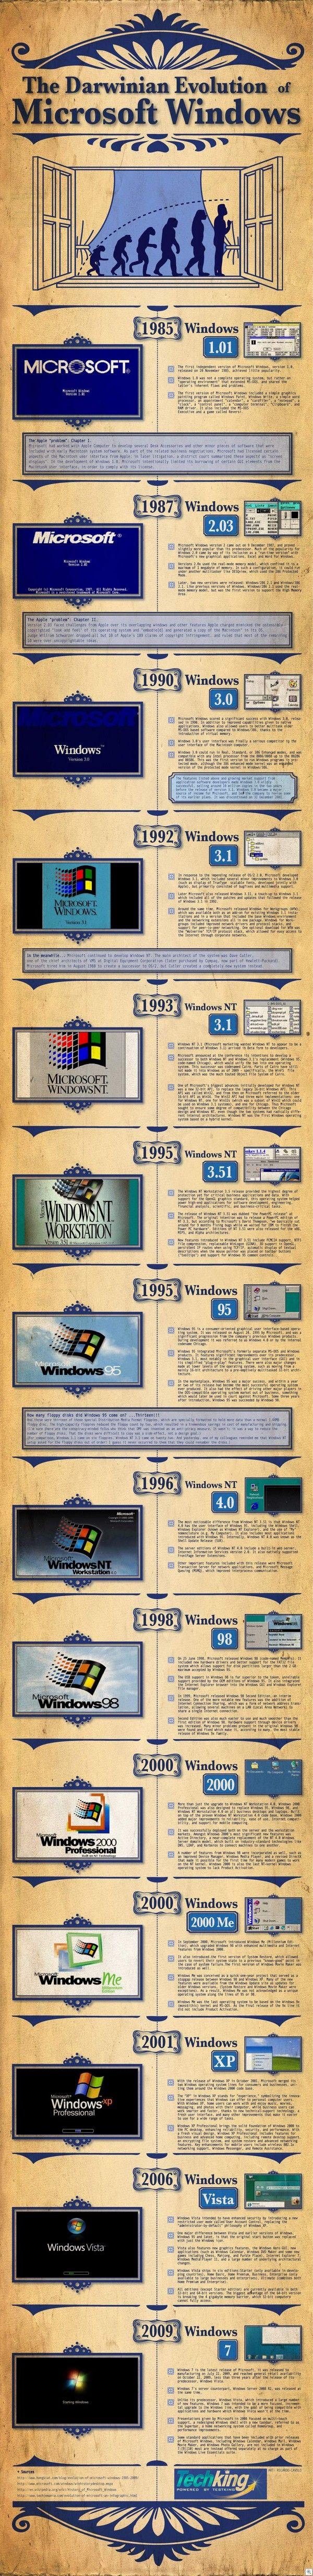 The Darwinian Evolution of Microsoft Windows :)